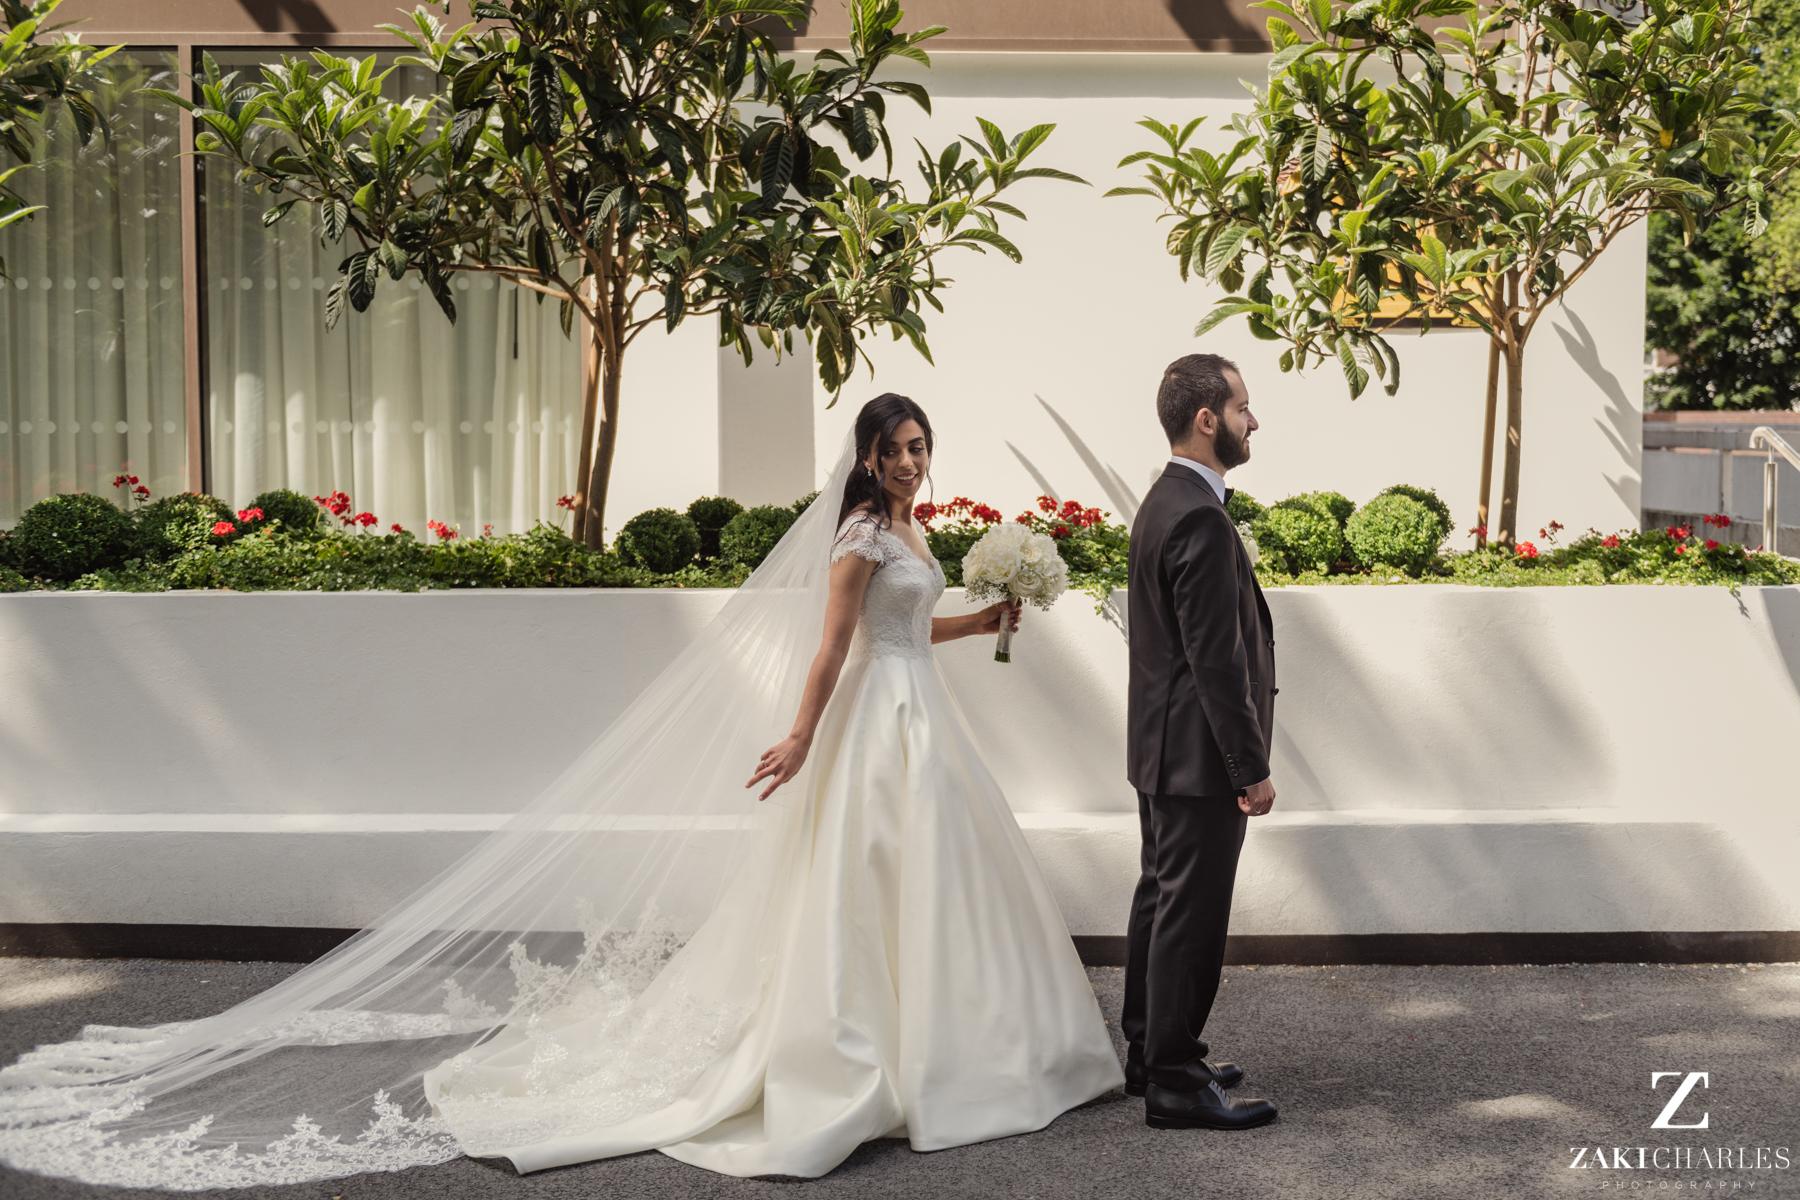 First look between Bride and Groom 5